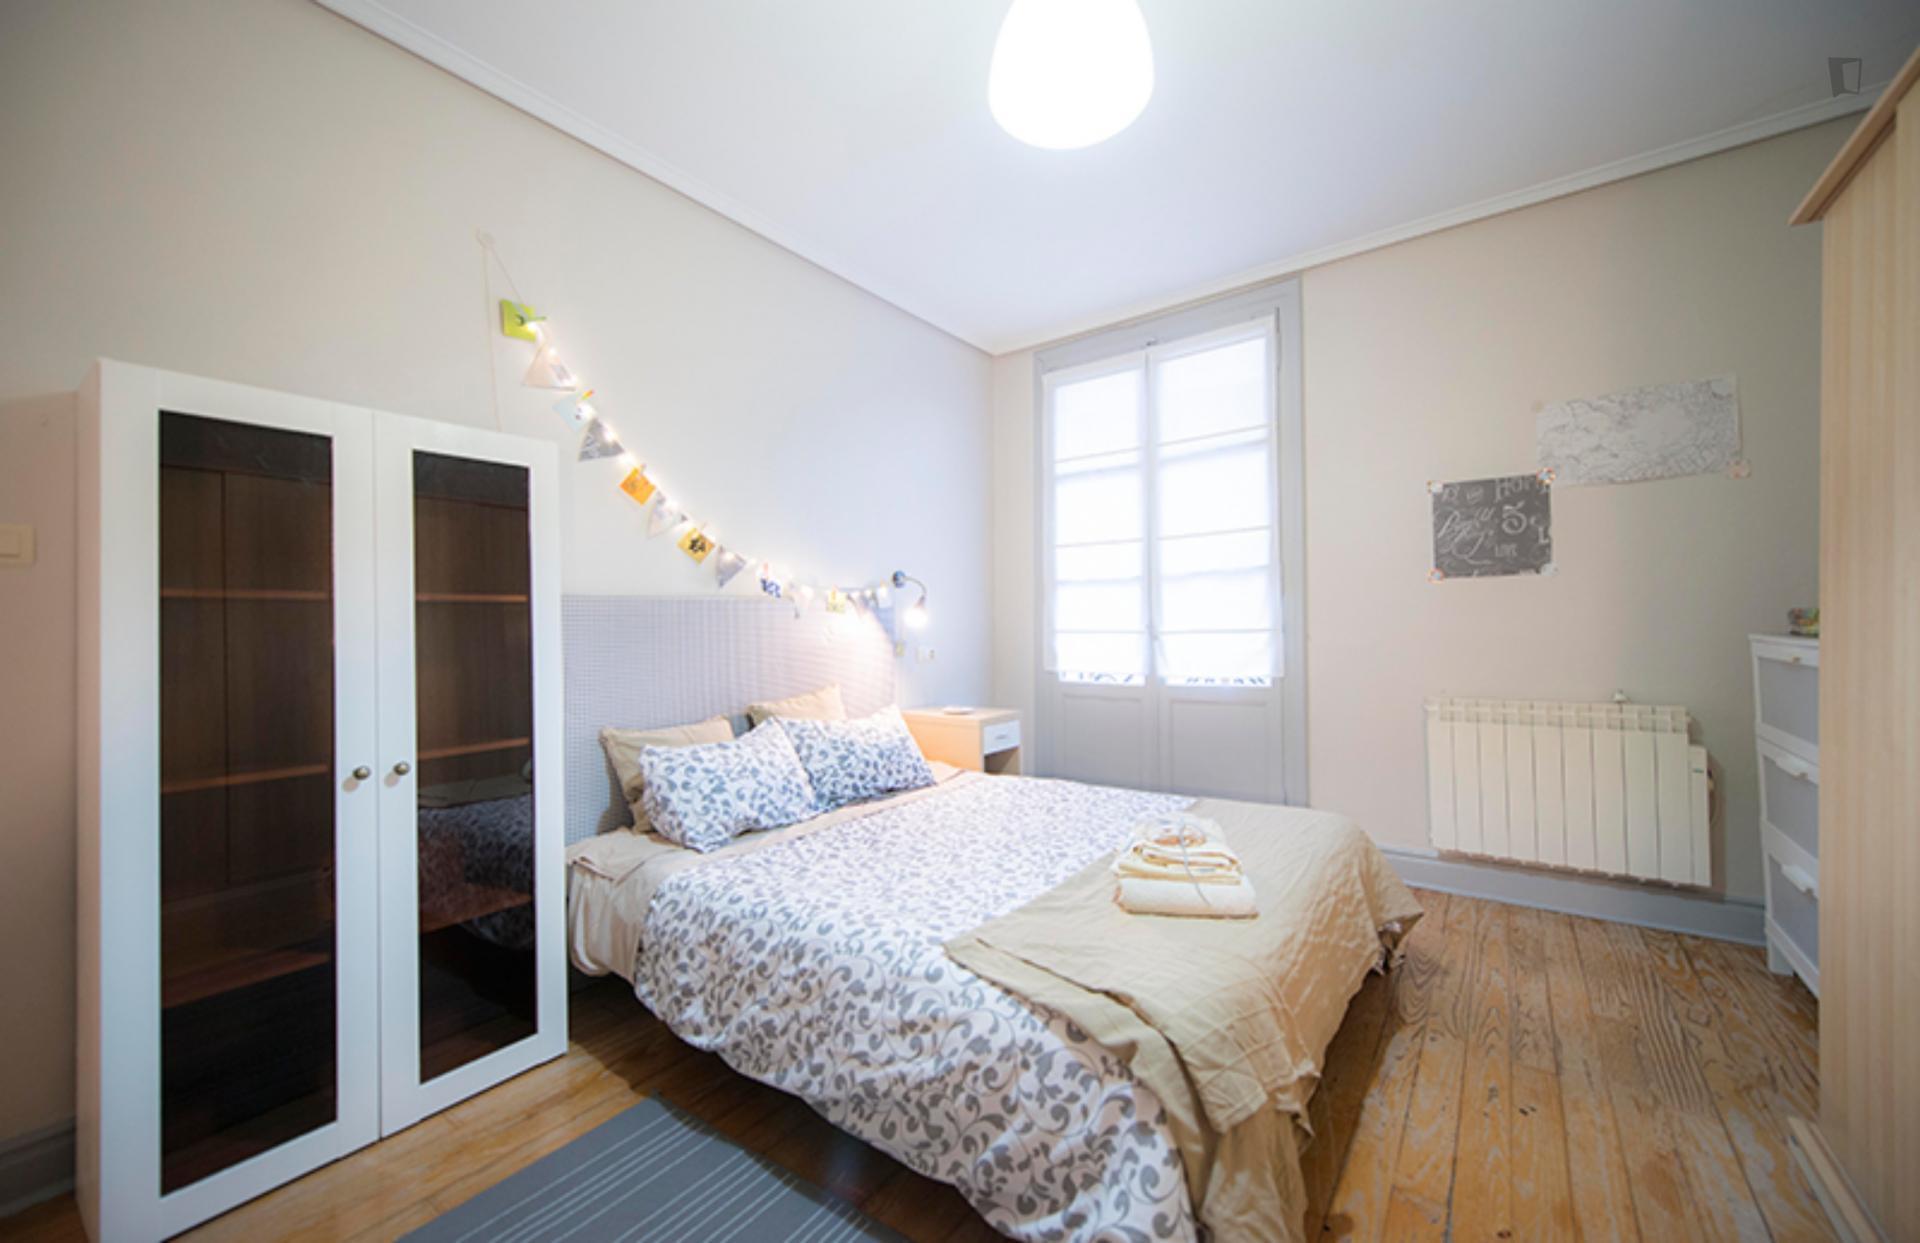 Casco Viejo - Alegre dormitorio en Bilbao